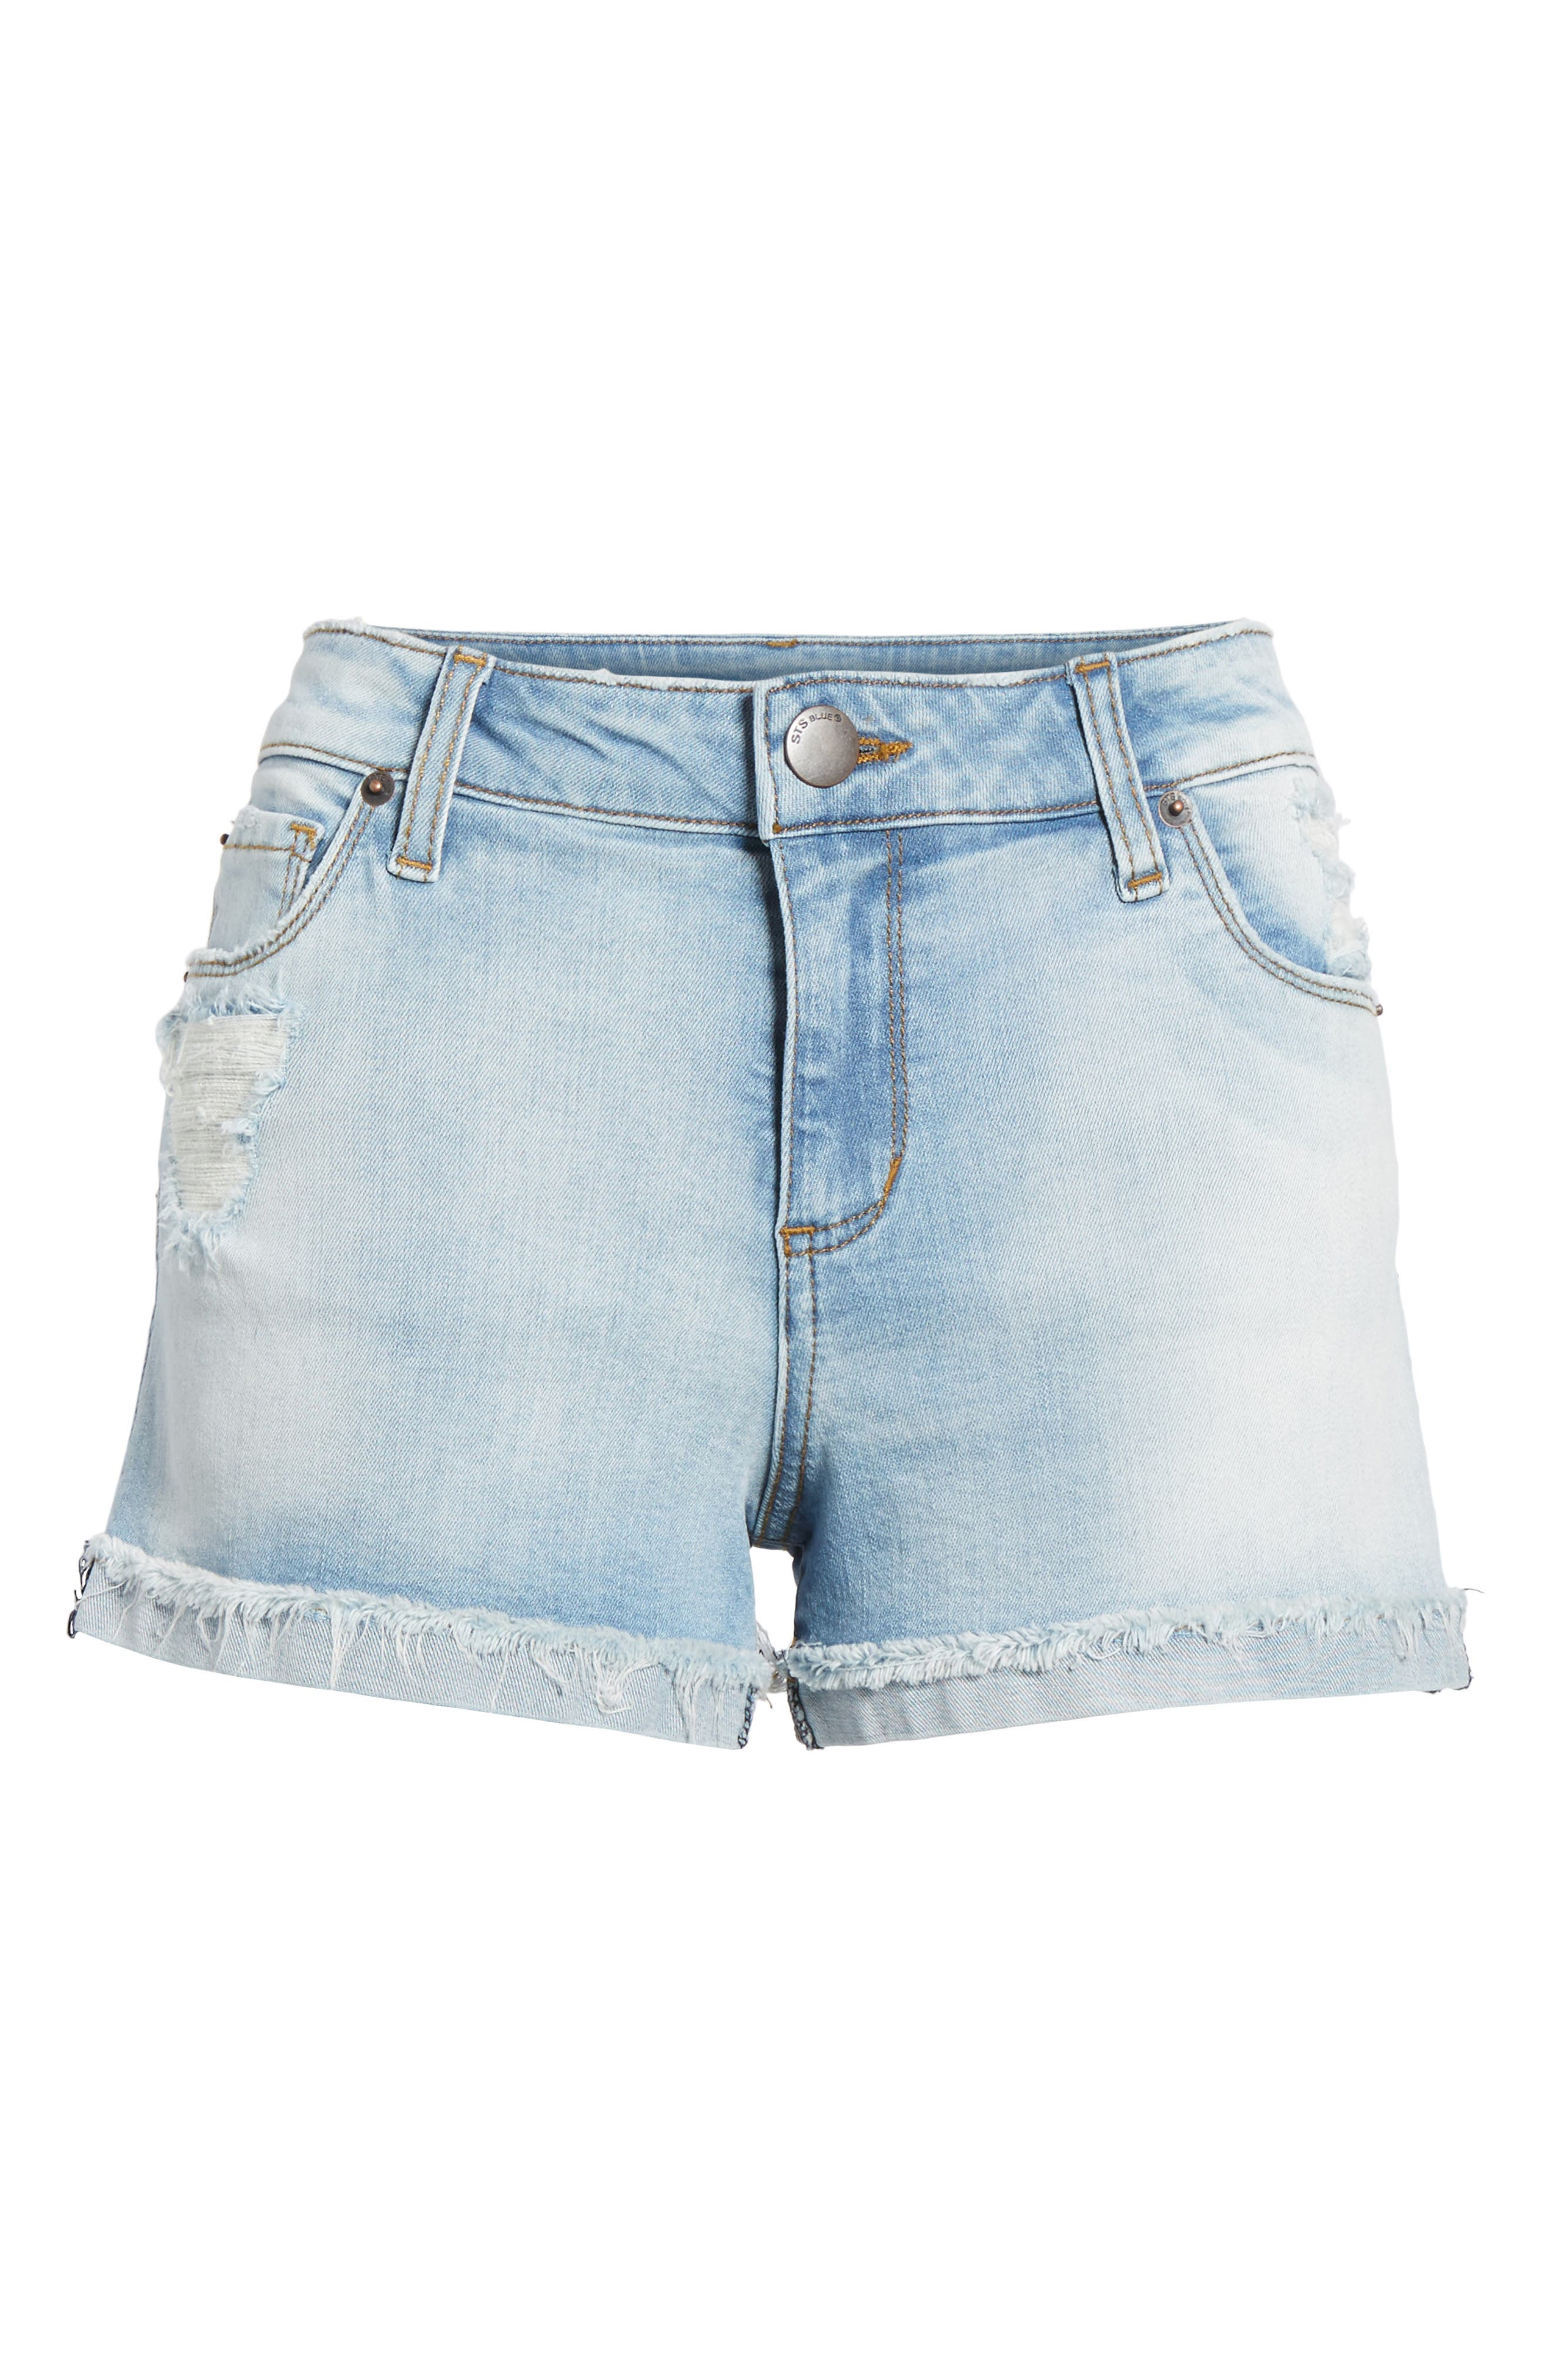 Distressed Denim Boyfriend Shorts,                             Alternate thumbnail 6, color,                             403